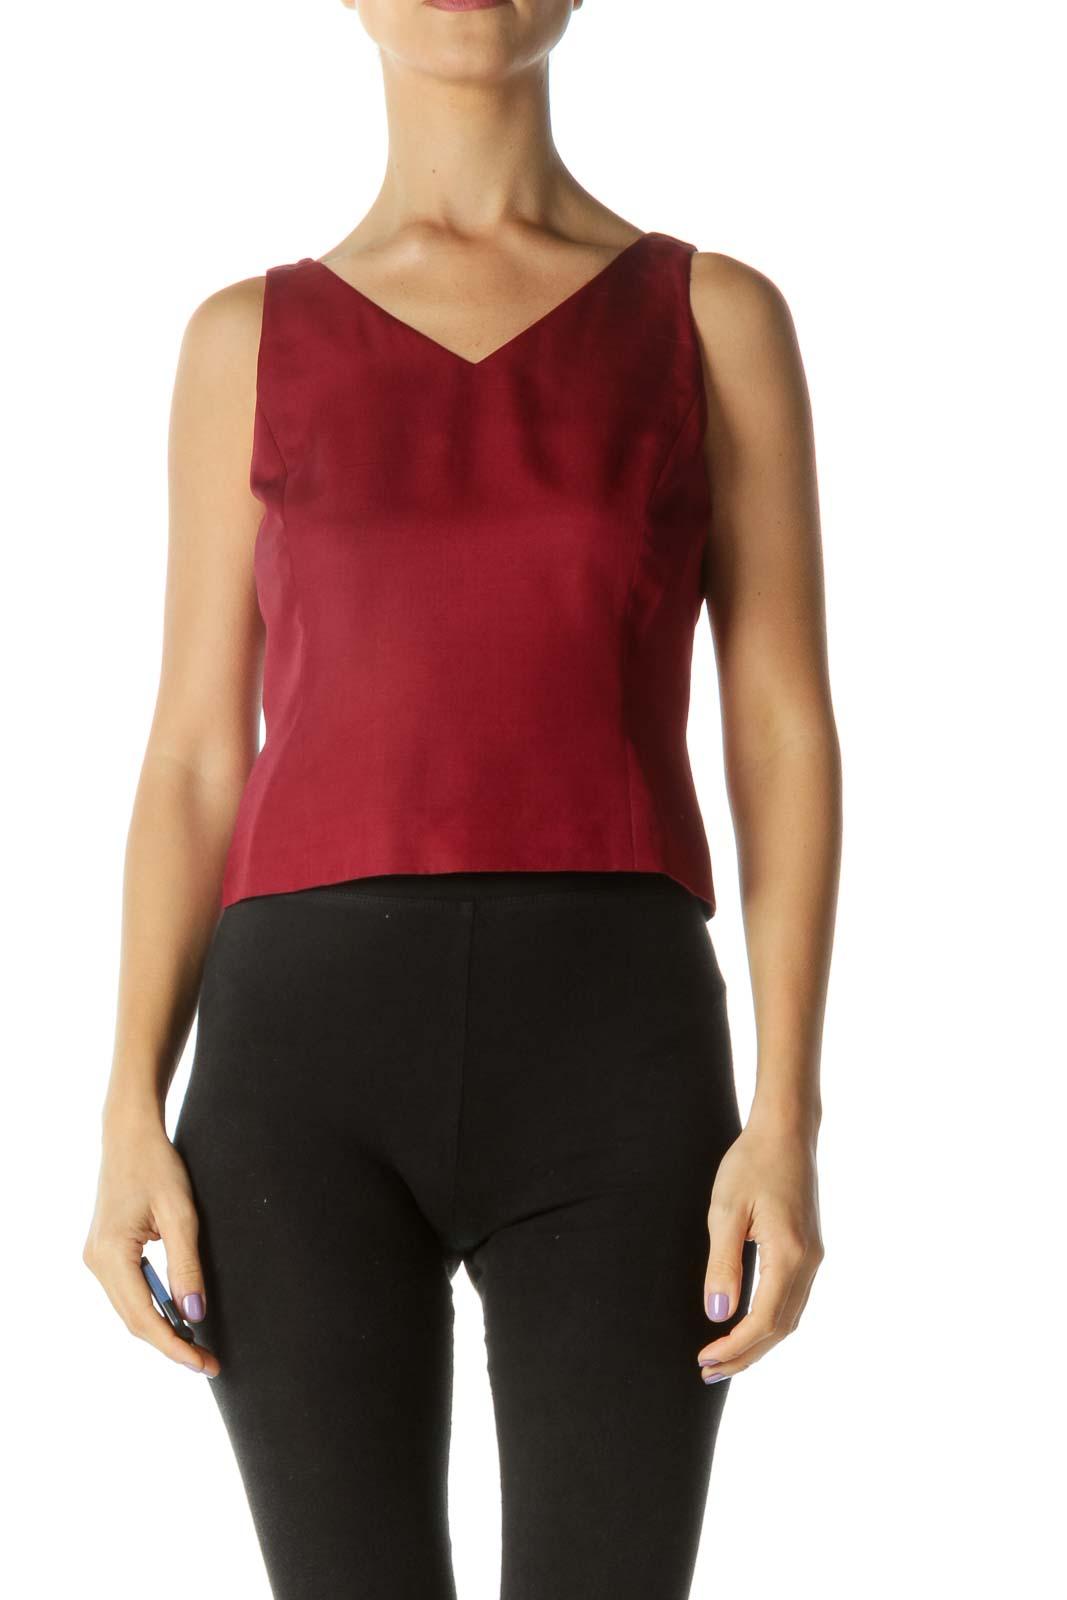 Burgundy Red Silk V-Neck Sleeveless Top